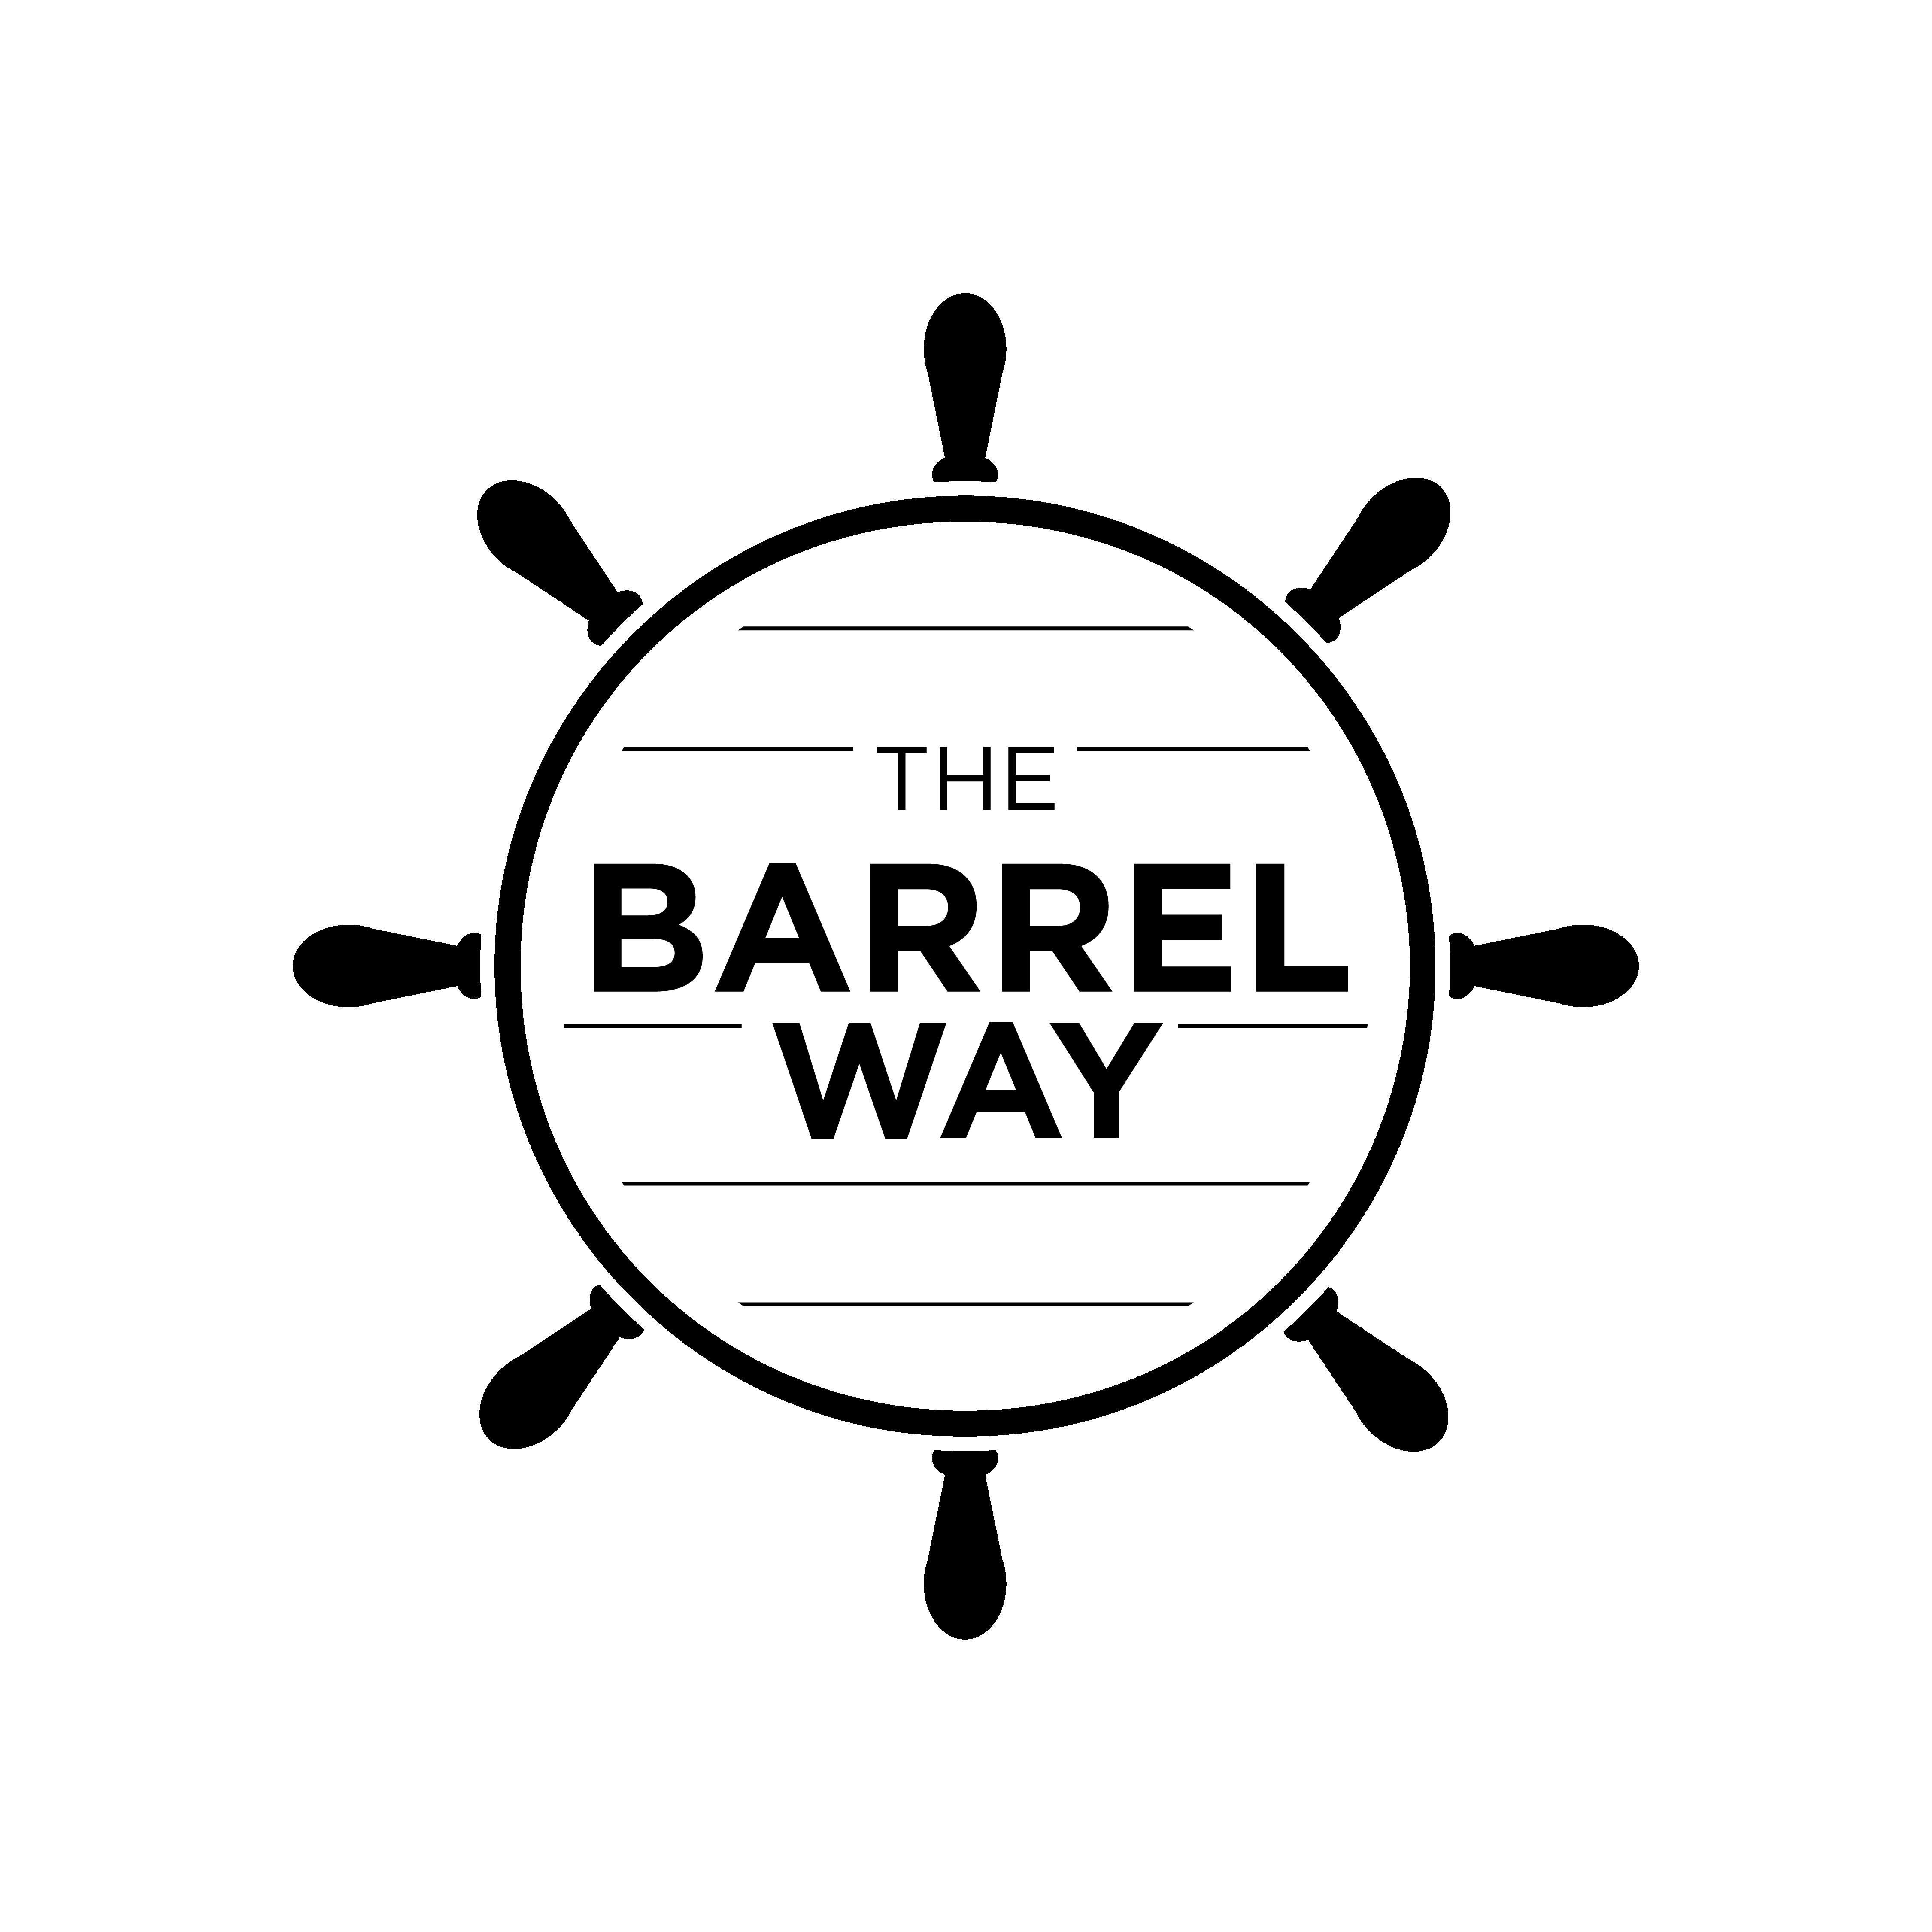 the barrel way logo